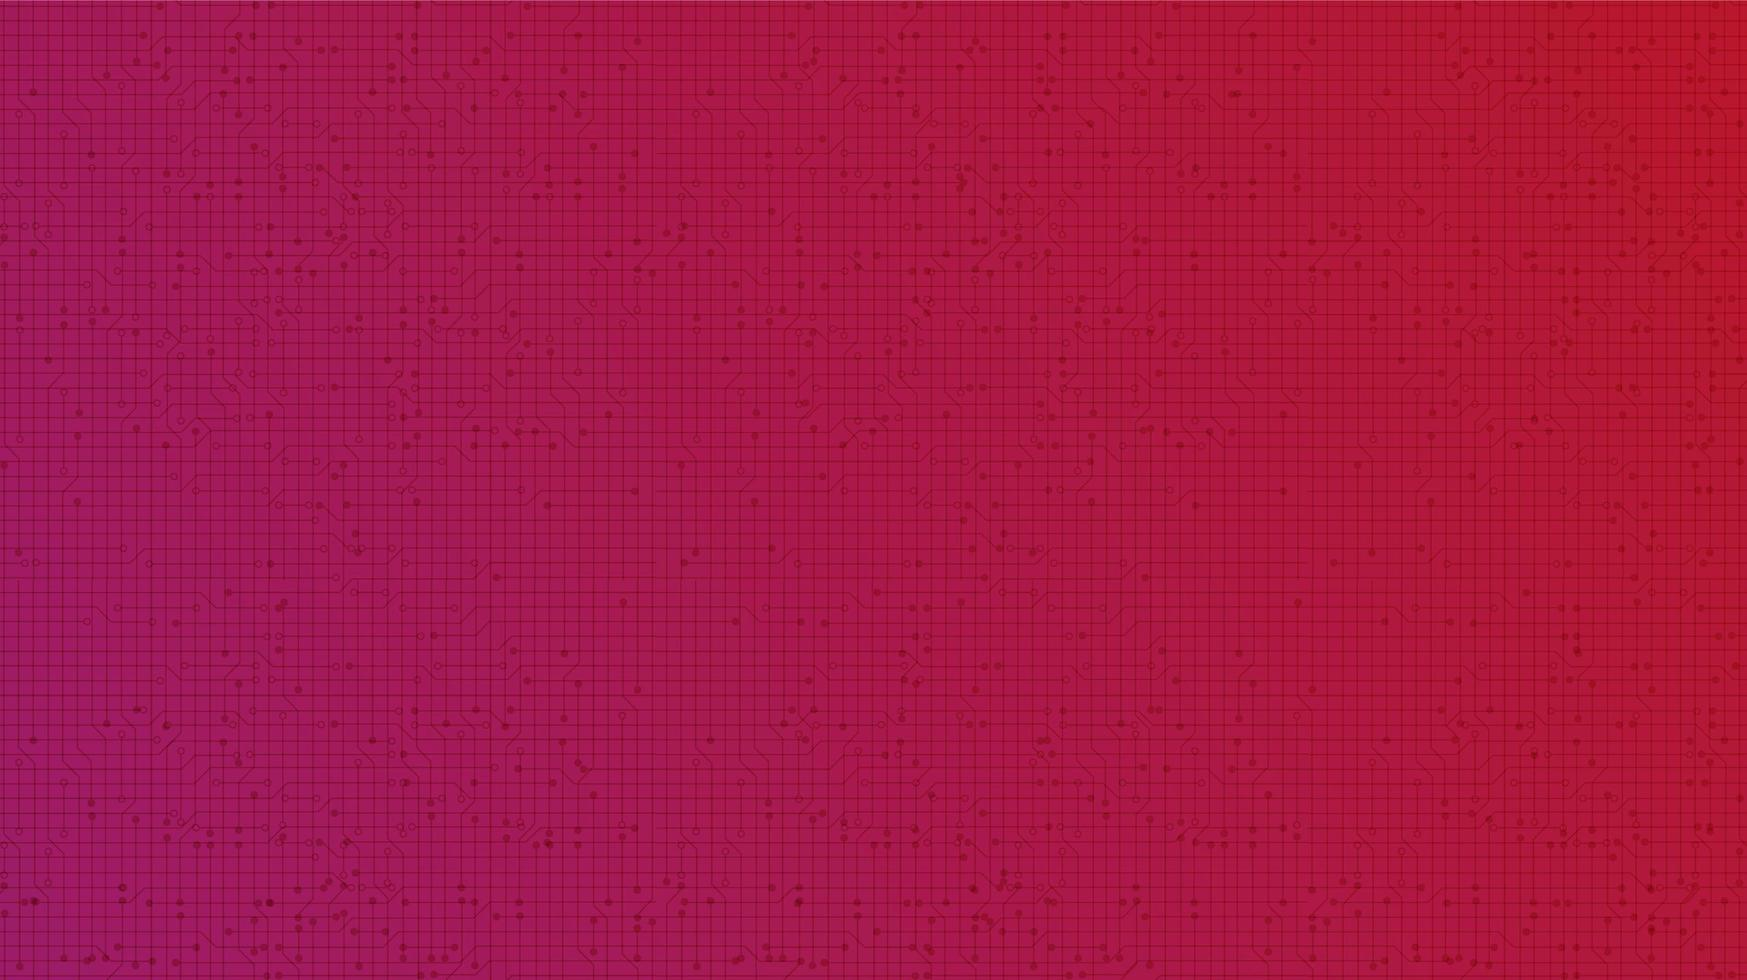 abstact roze technische achtergrond vector